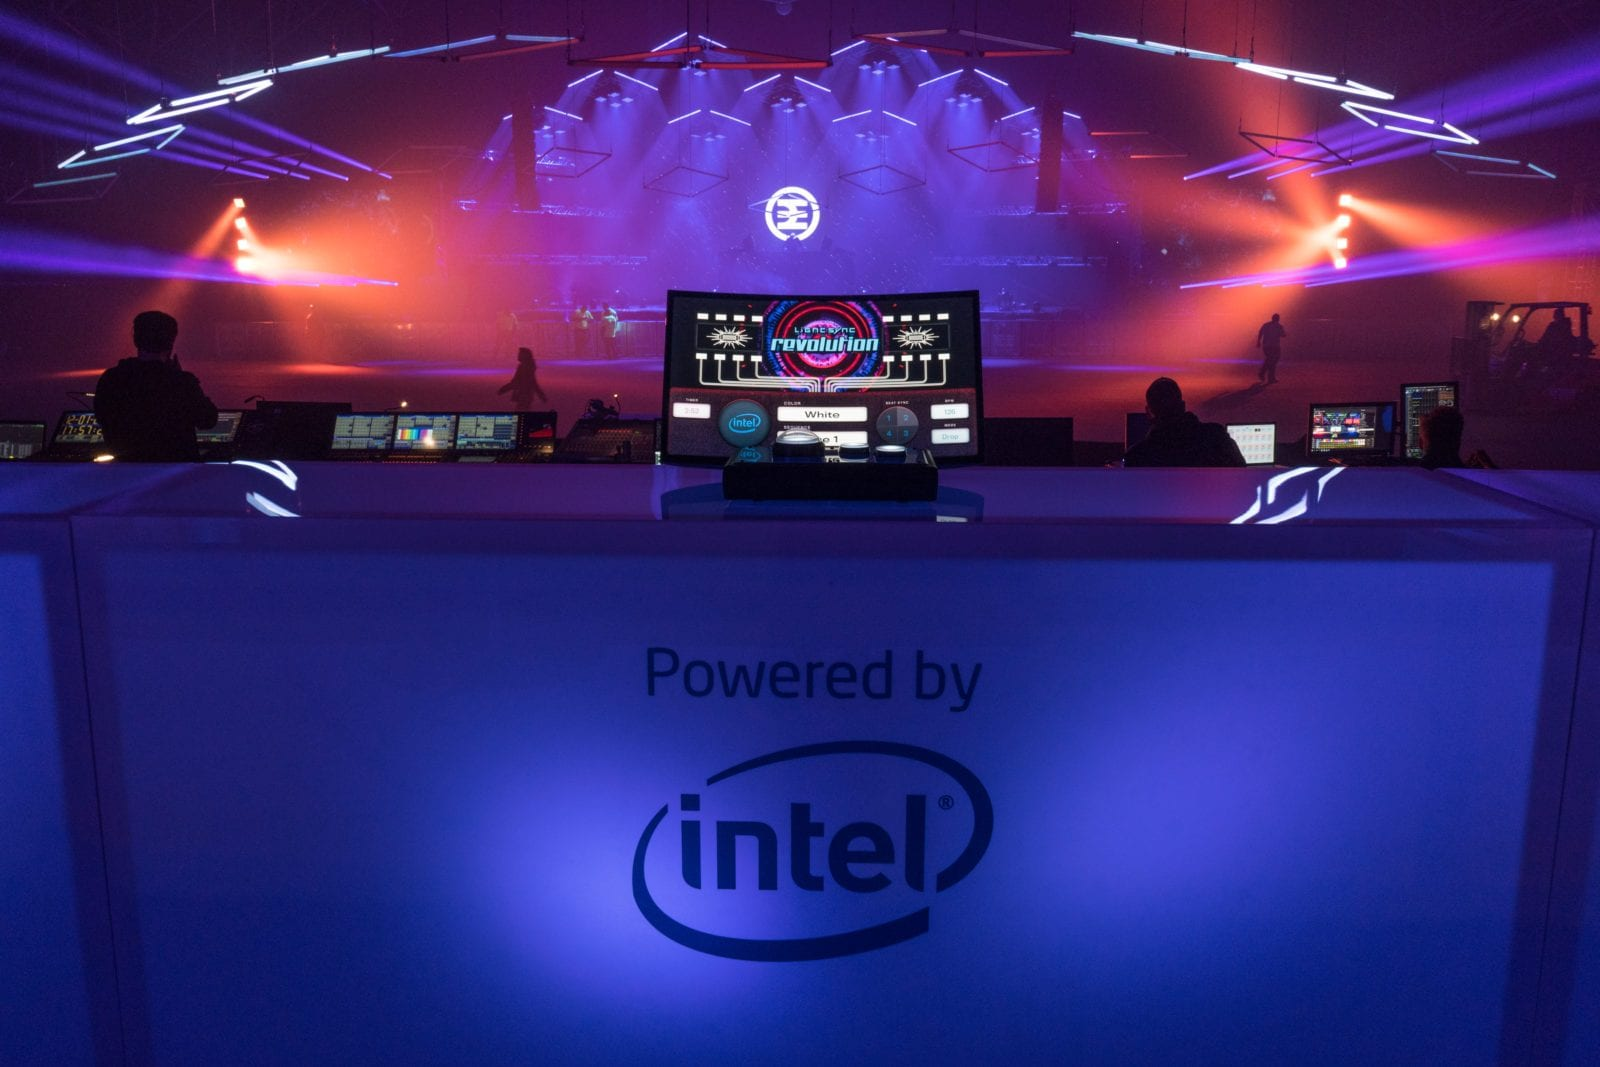 Intel Stage Control Desk